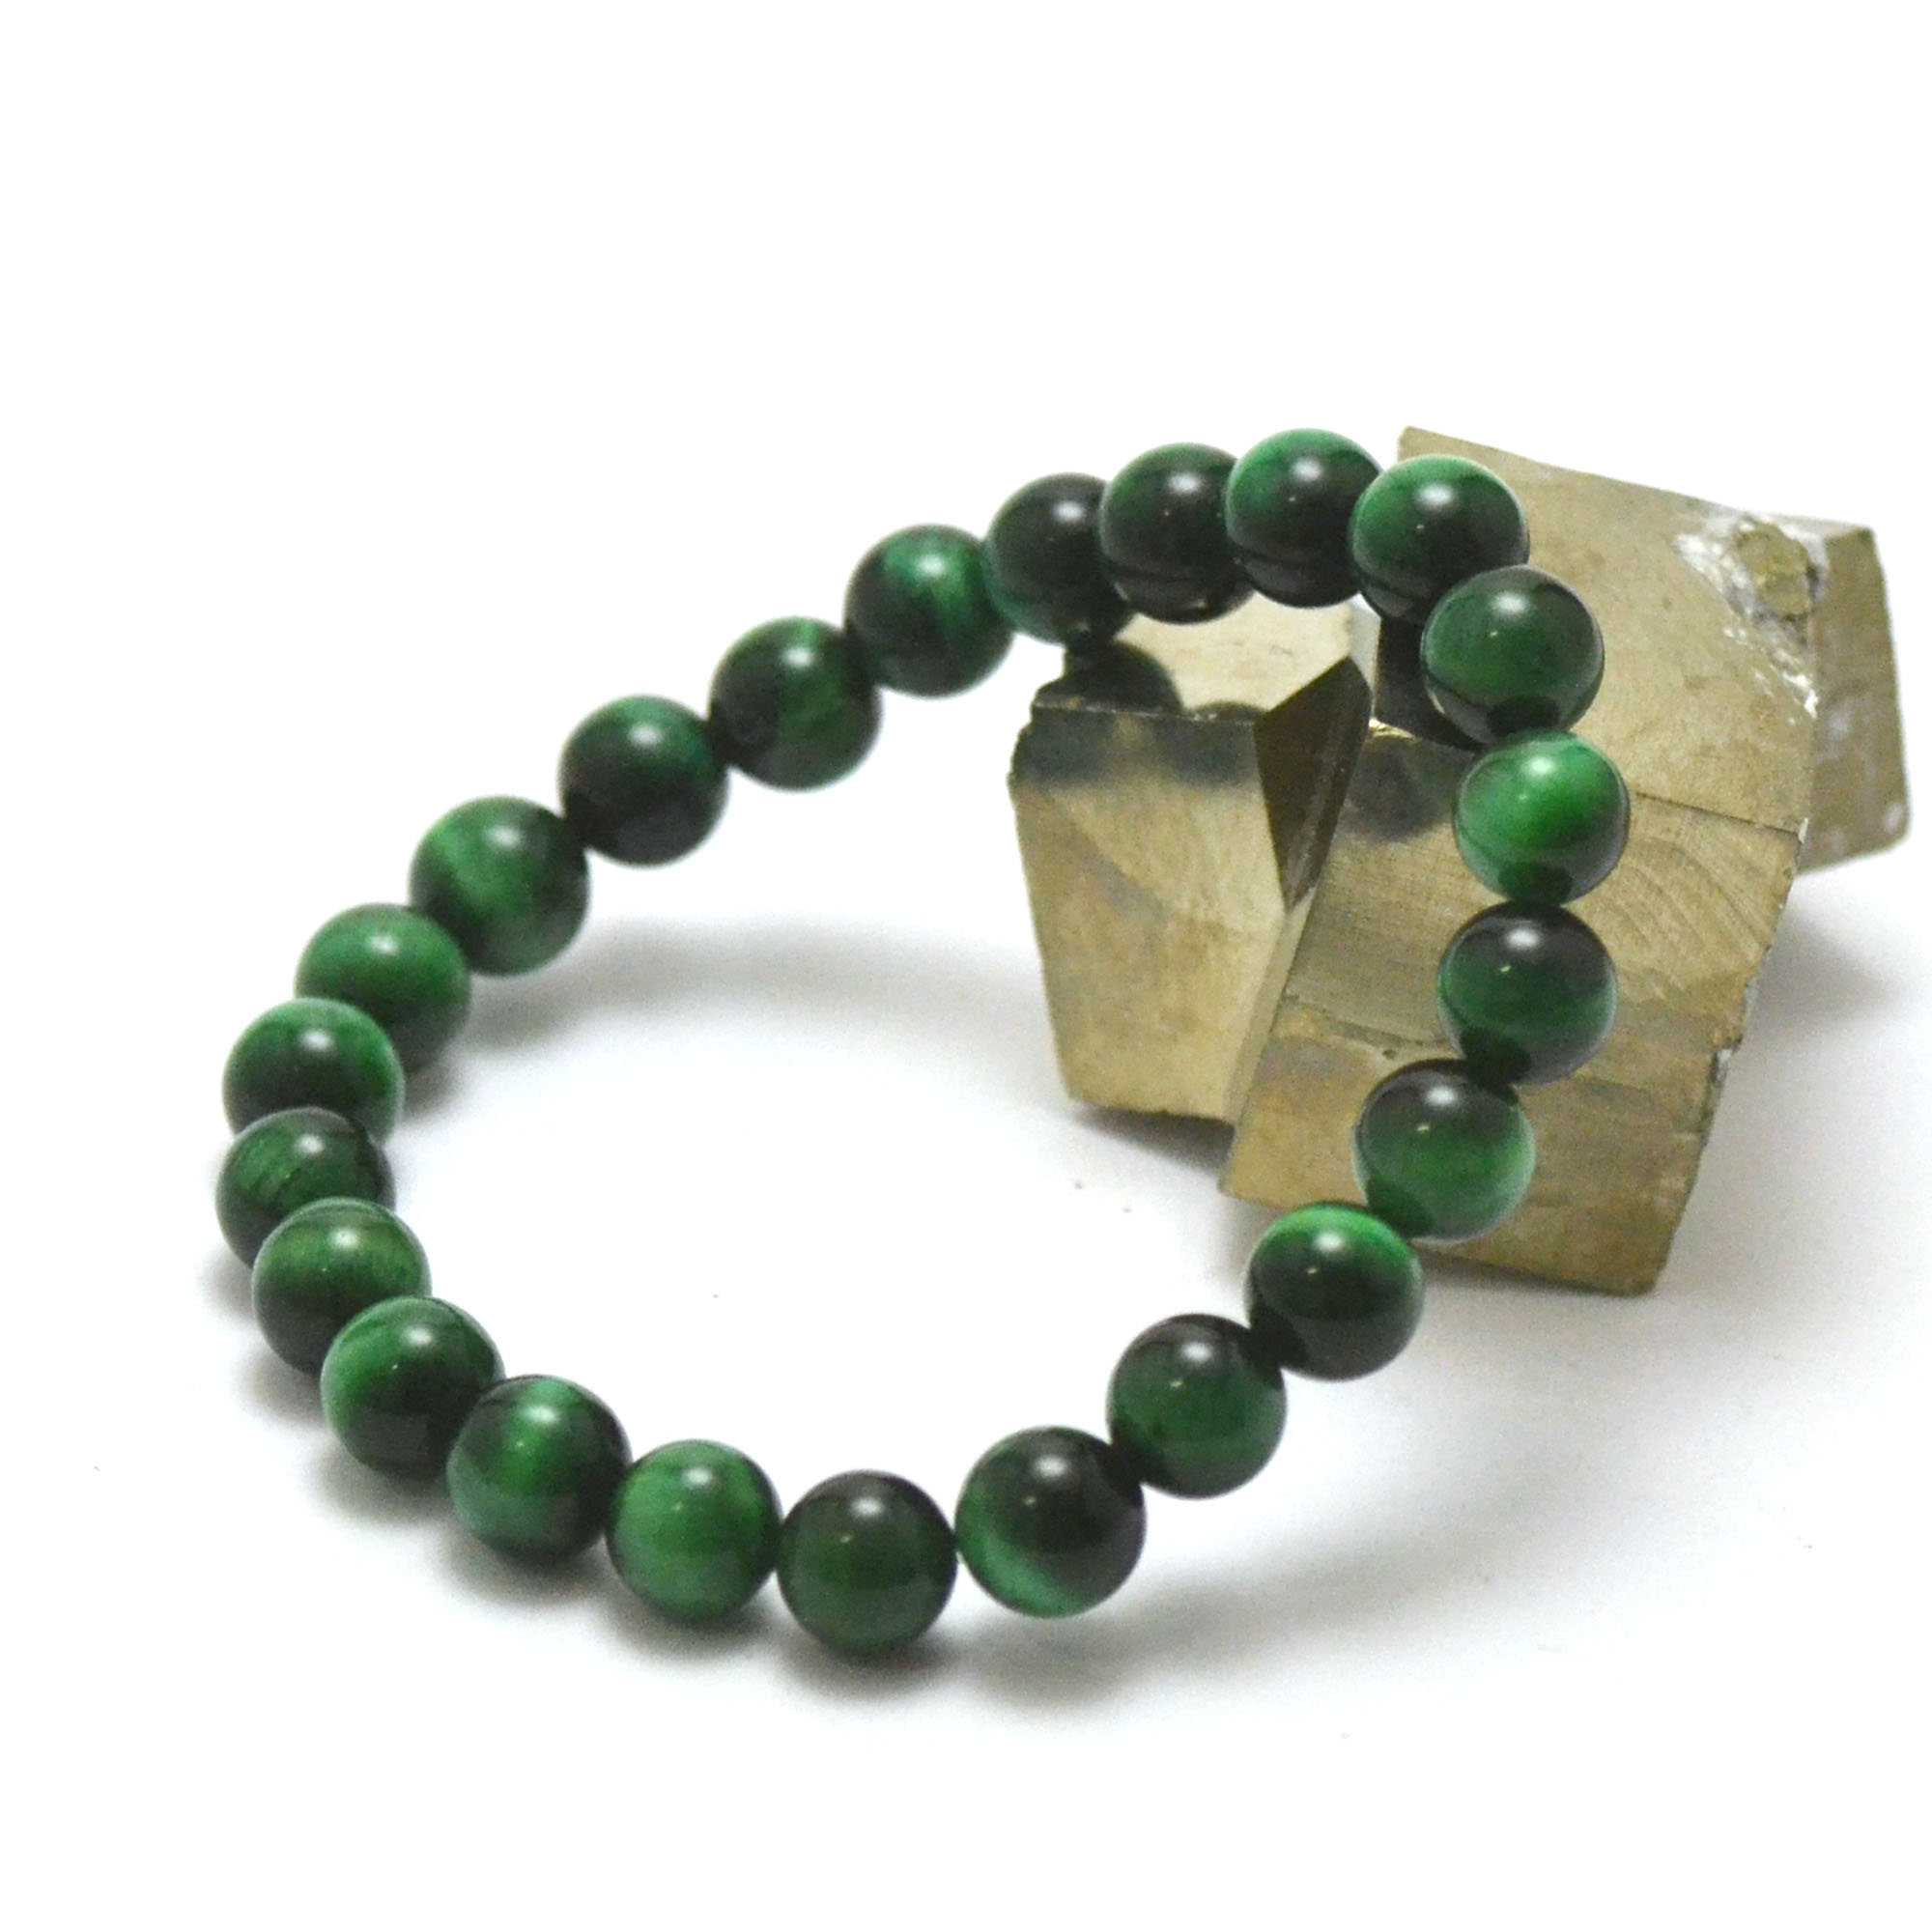 Bracelet oeil de tigre vert perle ronde 8 mm